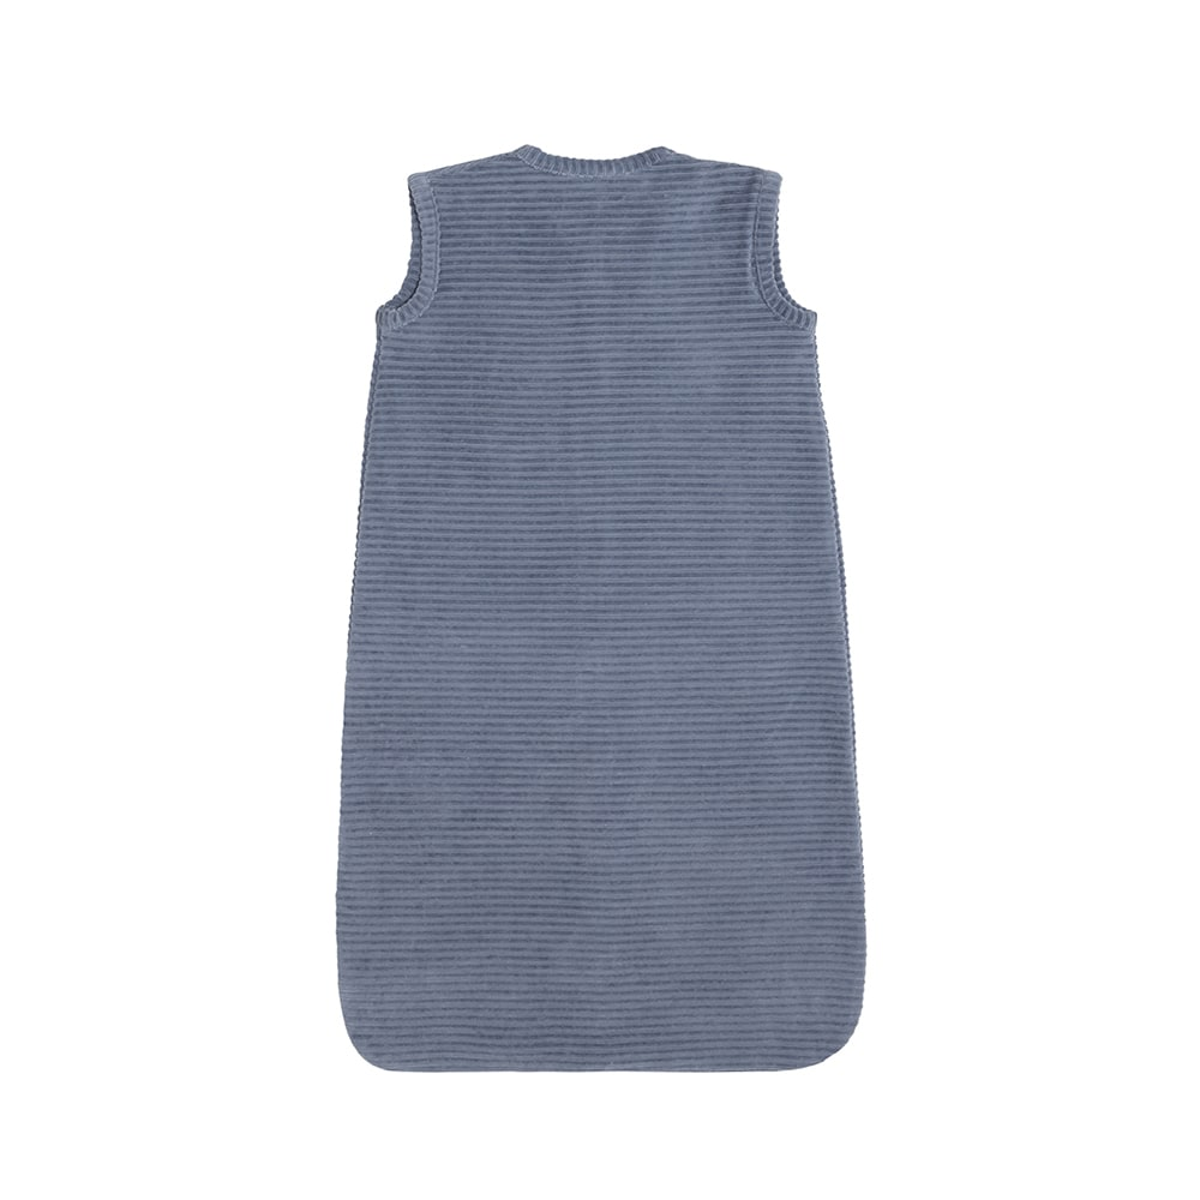 babys only bo02407303849 sense slaapzak vintage blue 70 cm 2